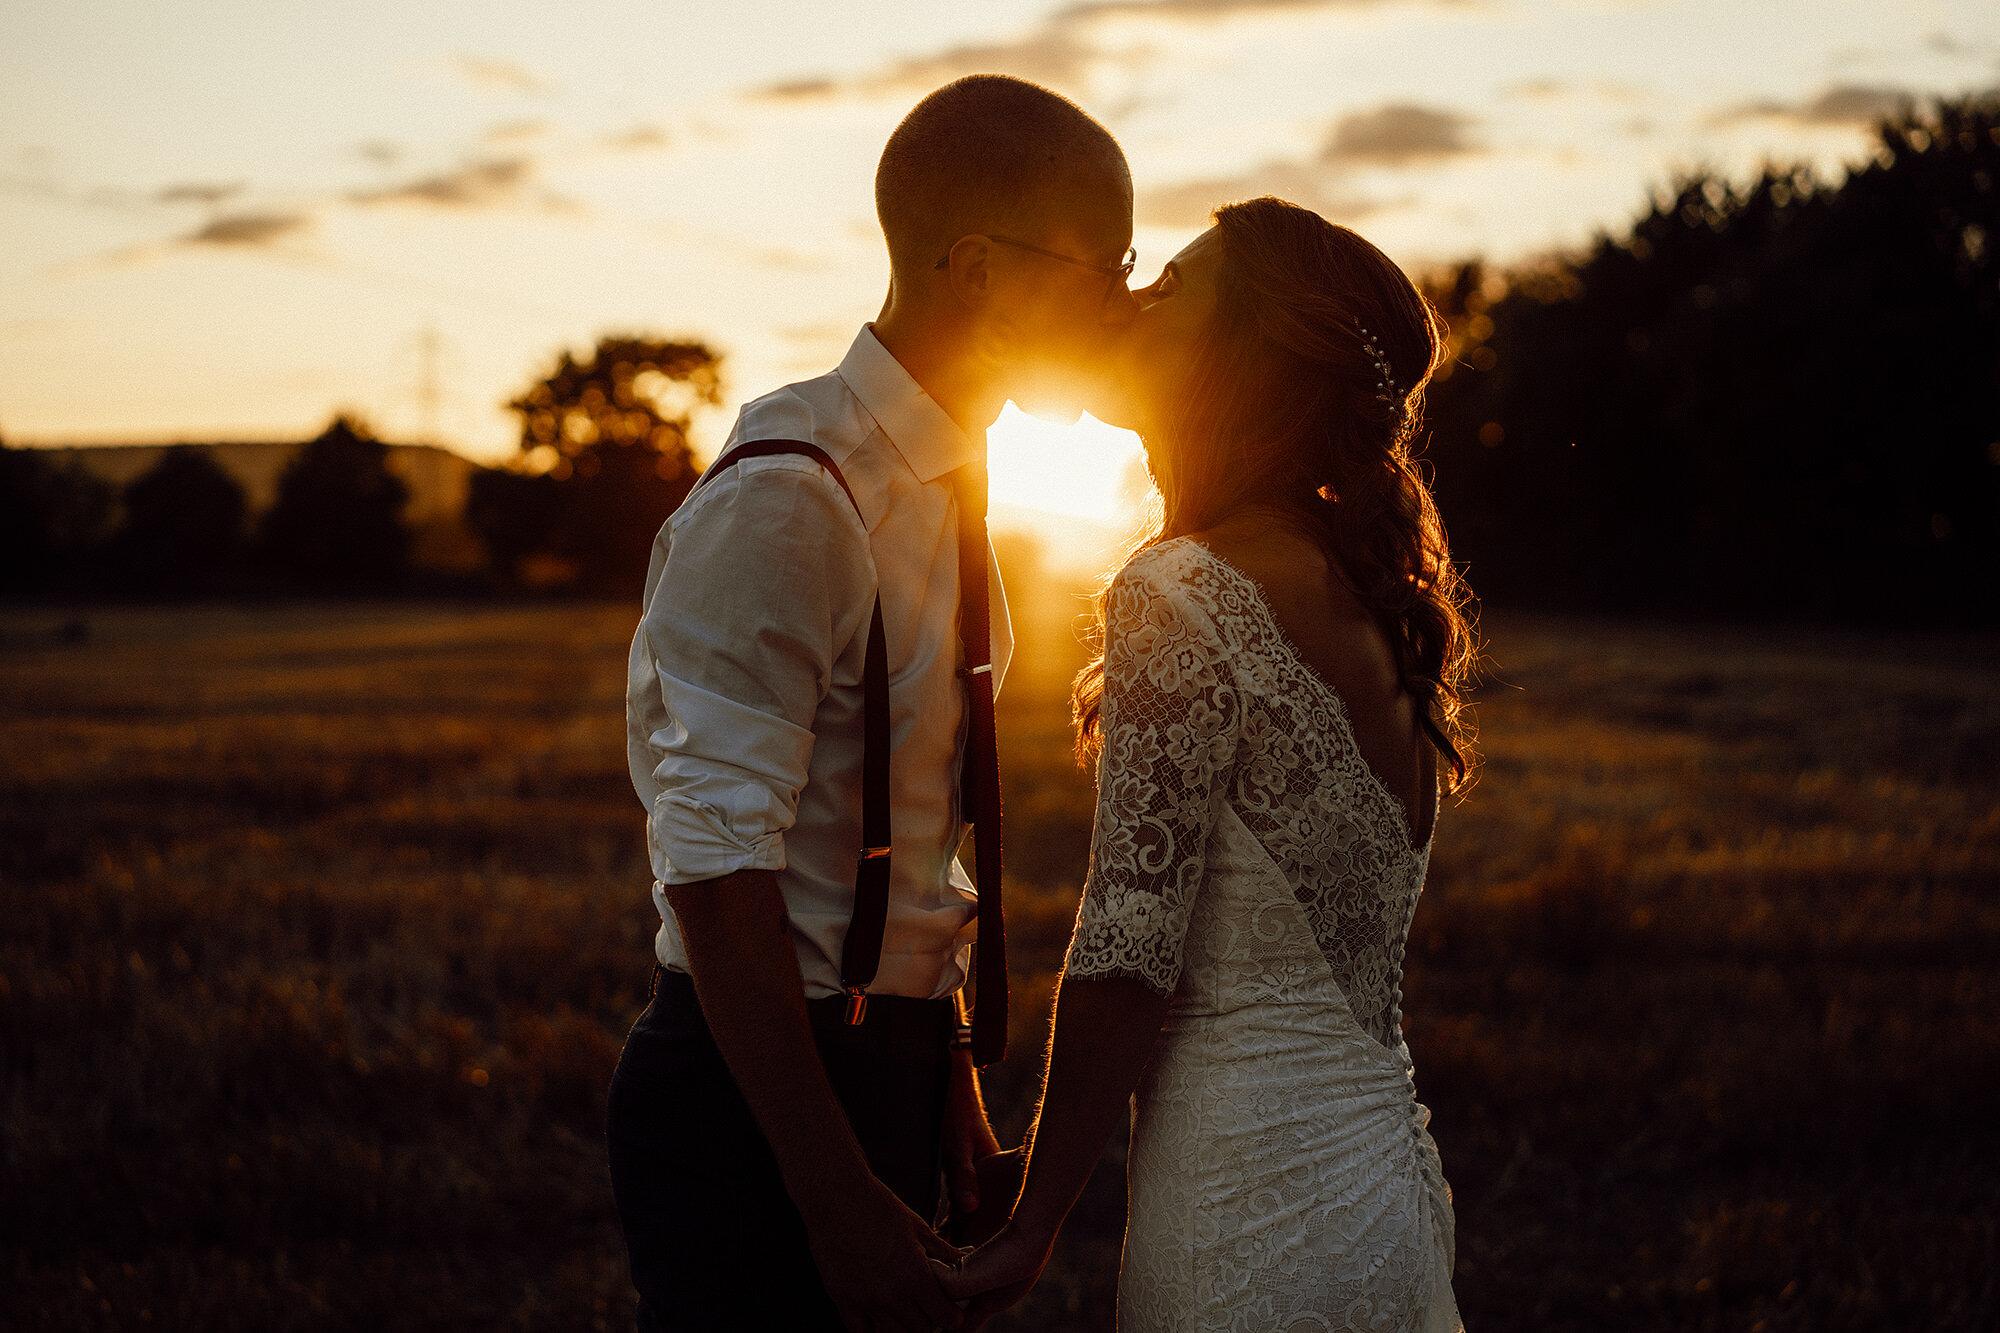 Weddings By Tom Langford - Hampshire Wedding Photographer